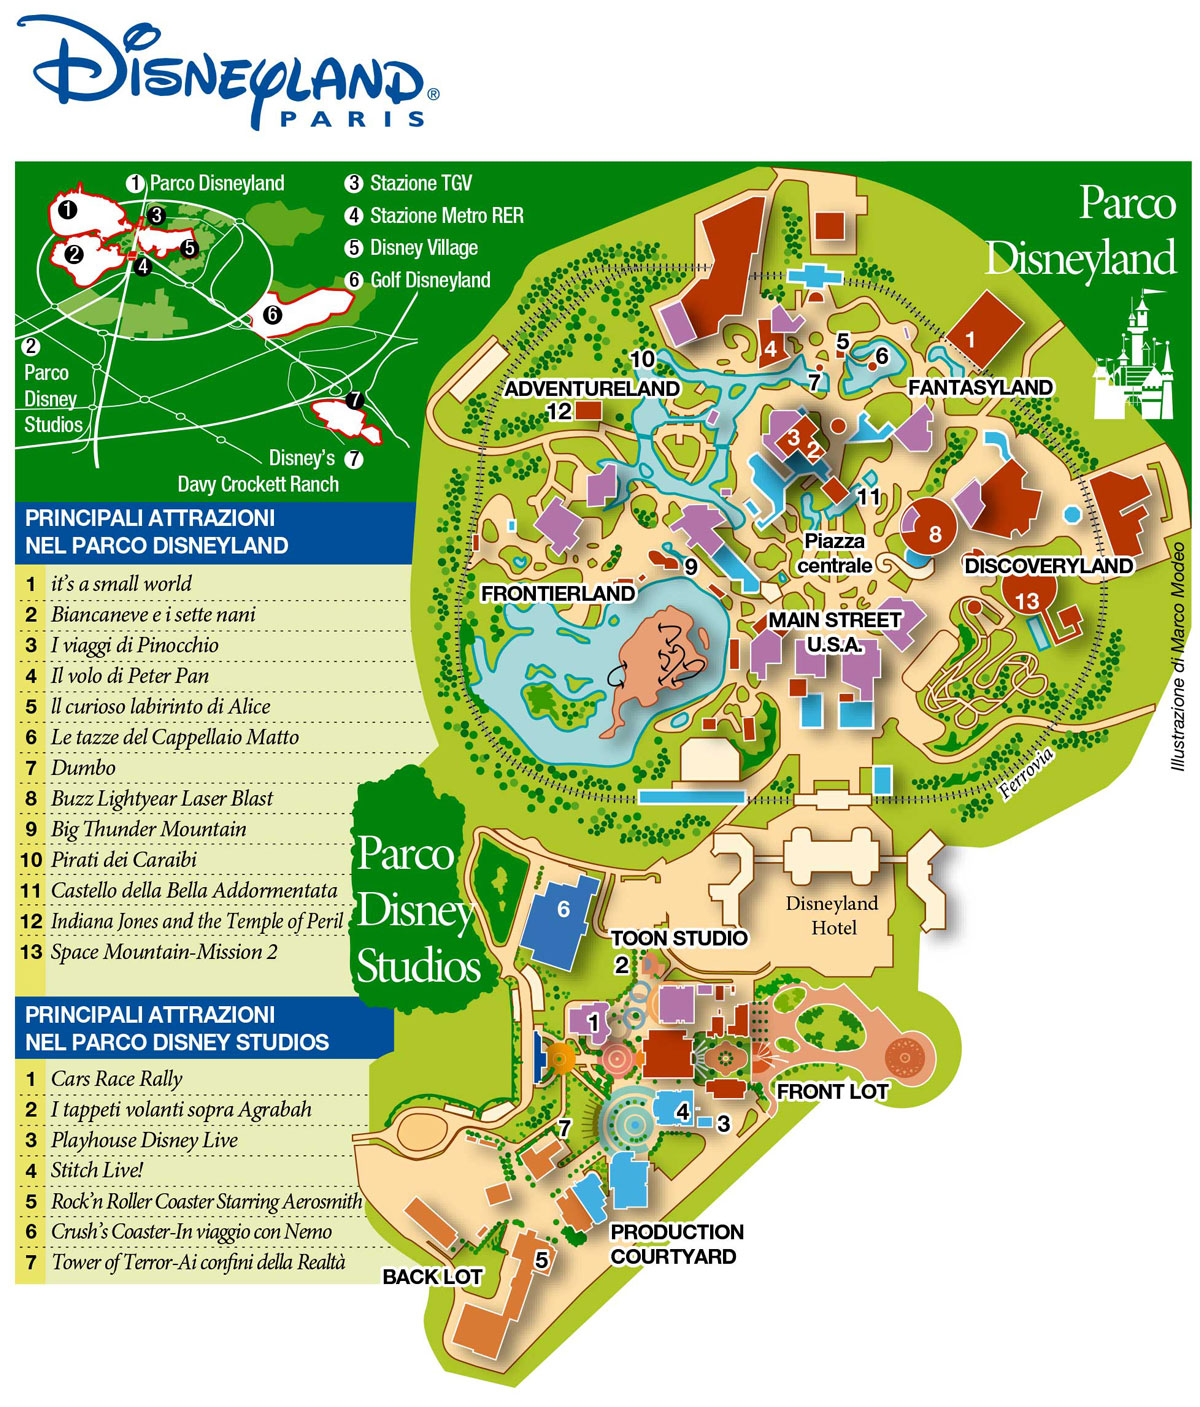 disneyland paris karte Disneyland Paris Map – MarcoModeo.com disneyland paris karte